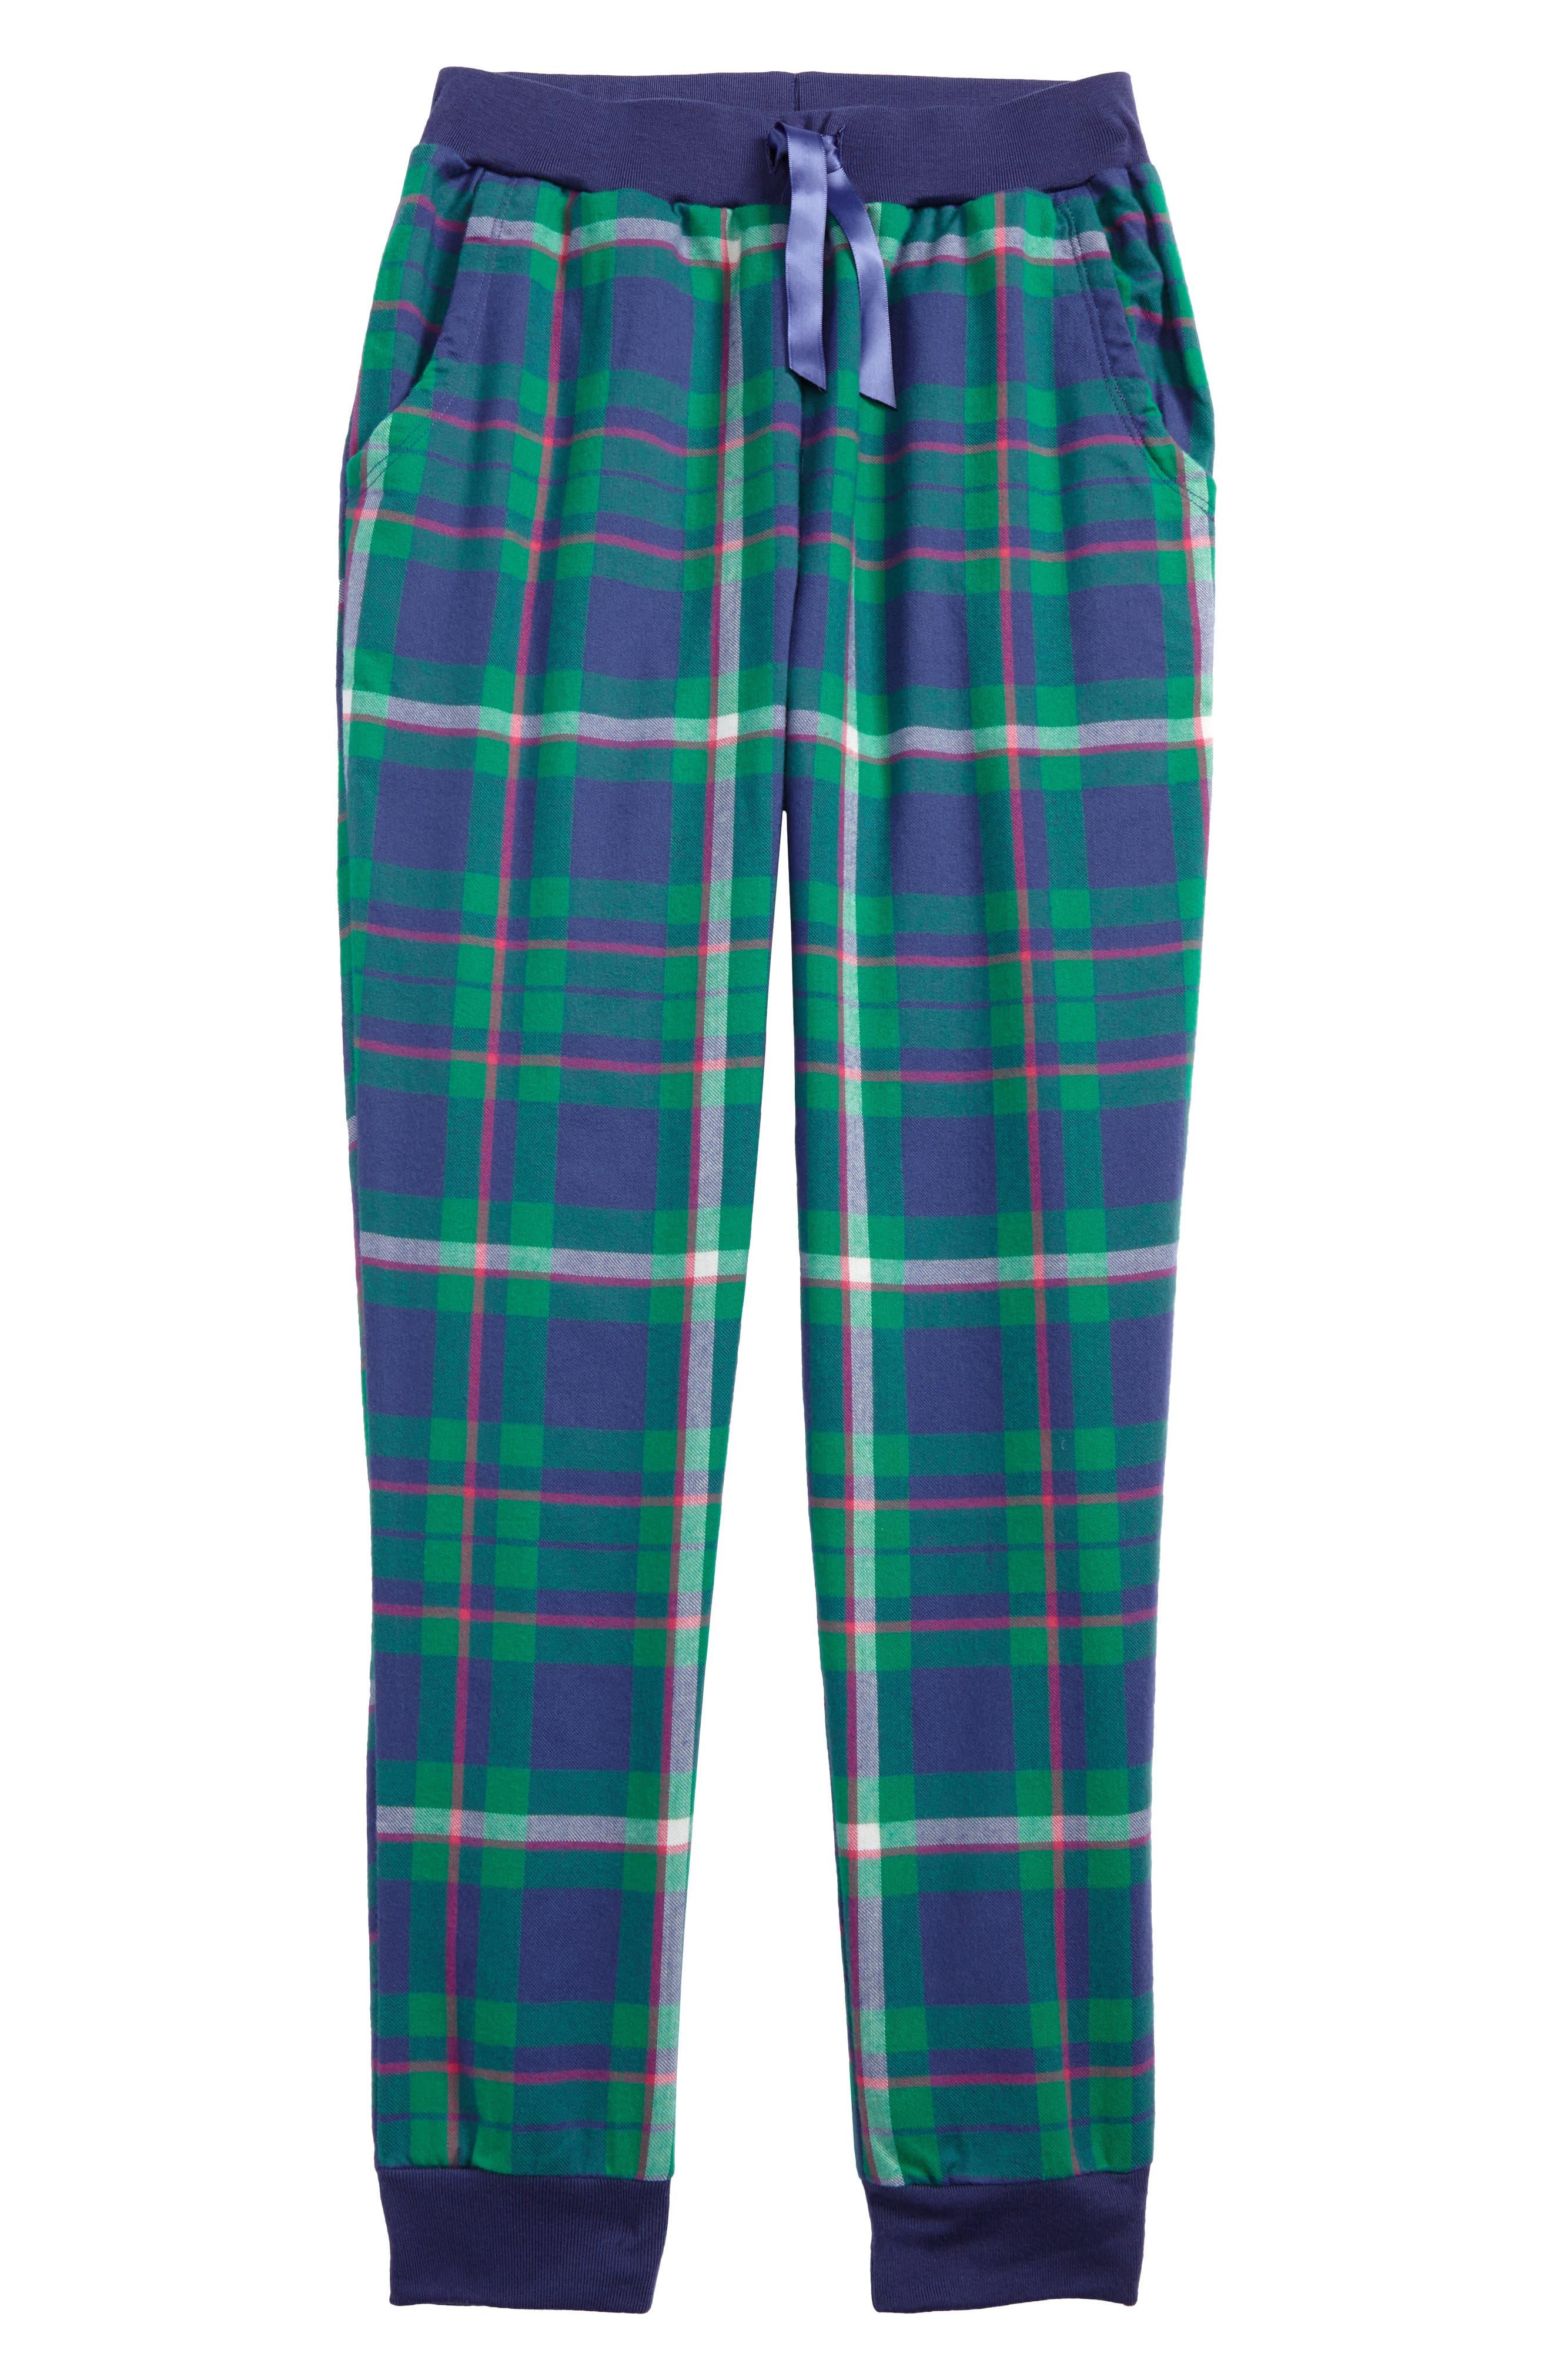 Flannel Pajama Pants,                         Main,                         color, Green Genius Plaid